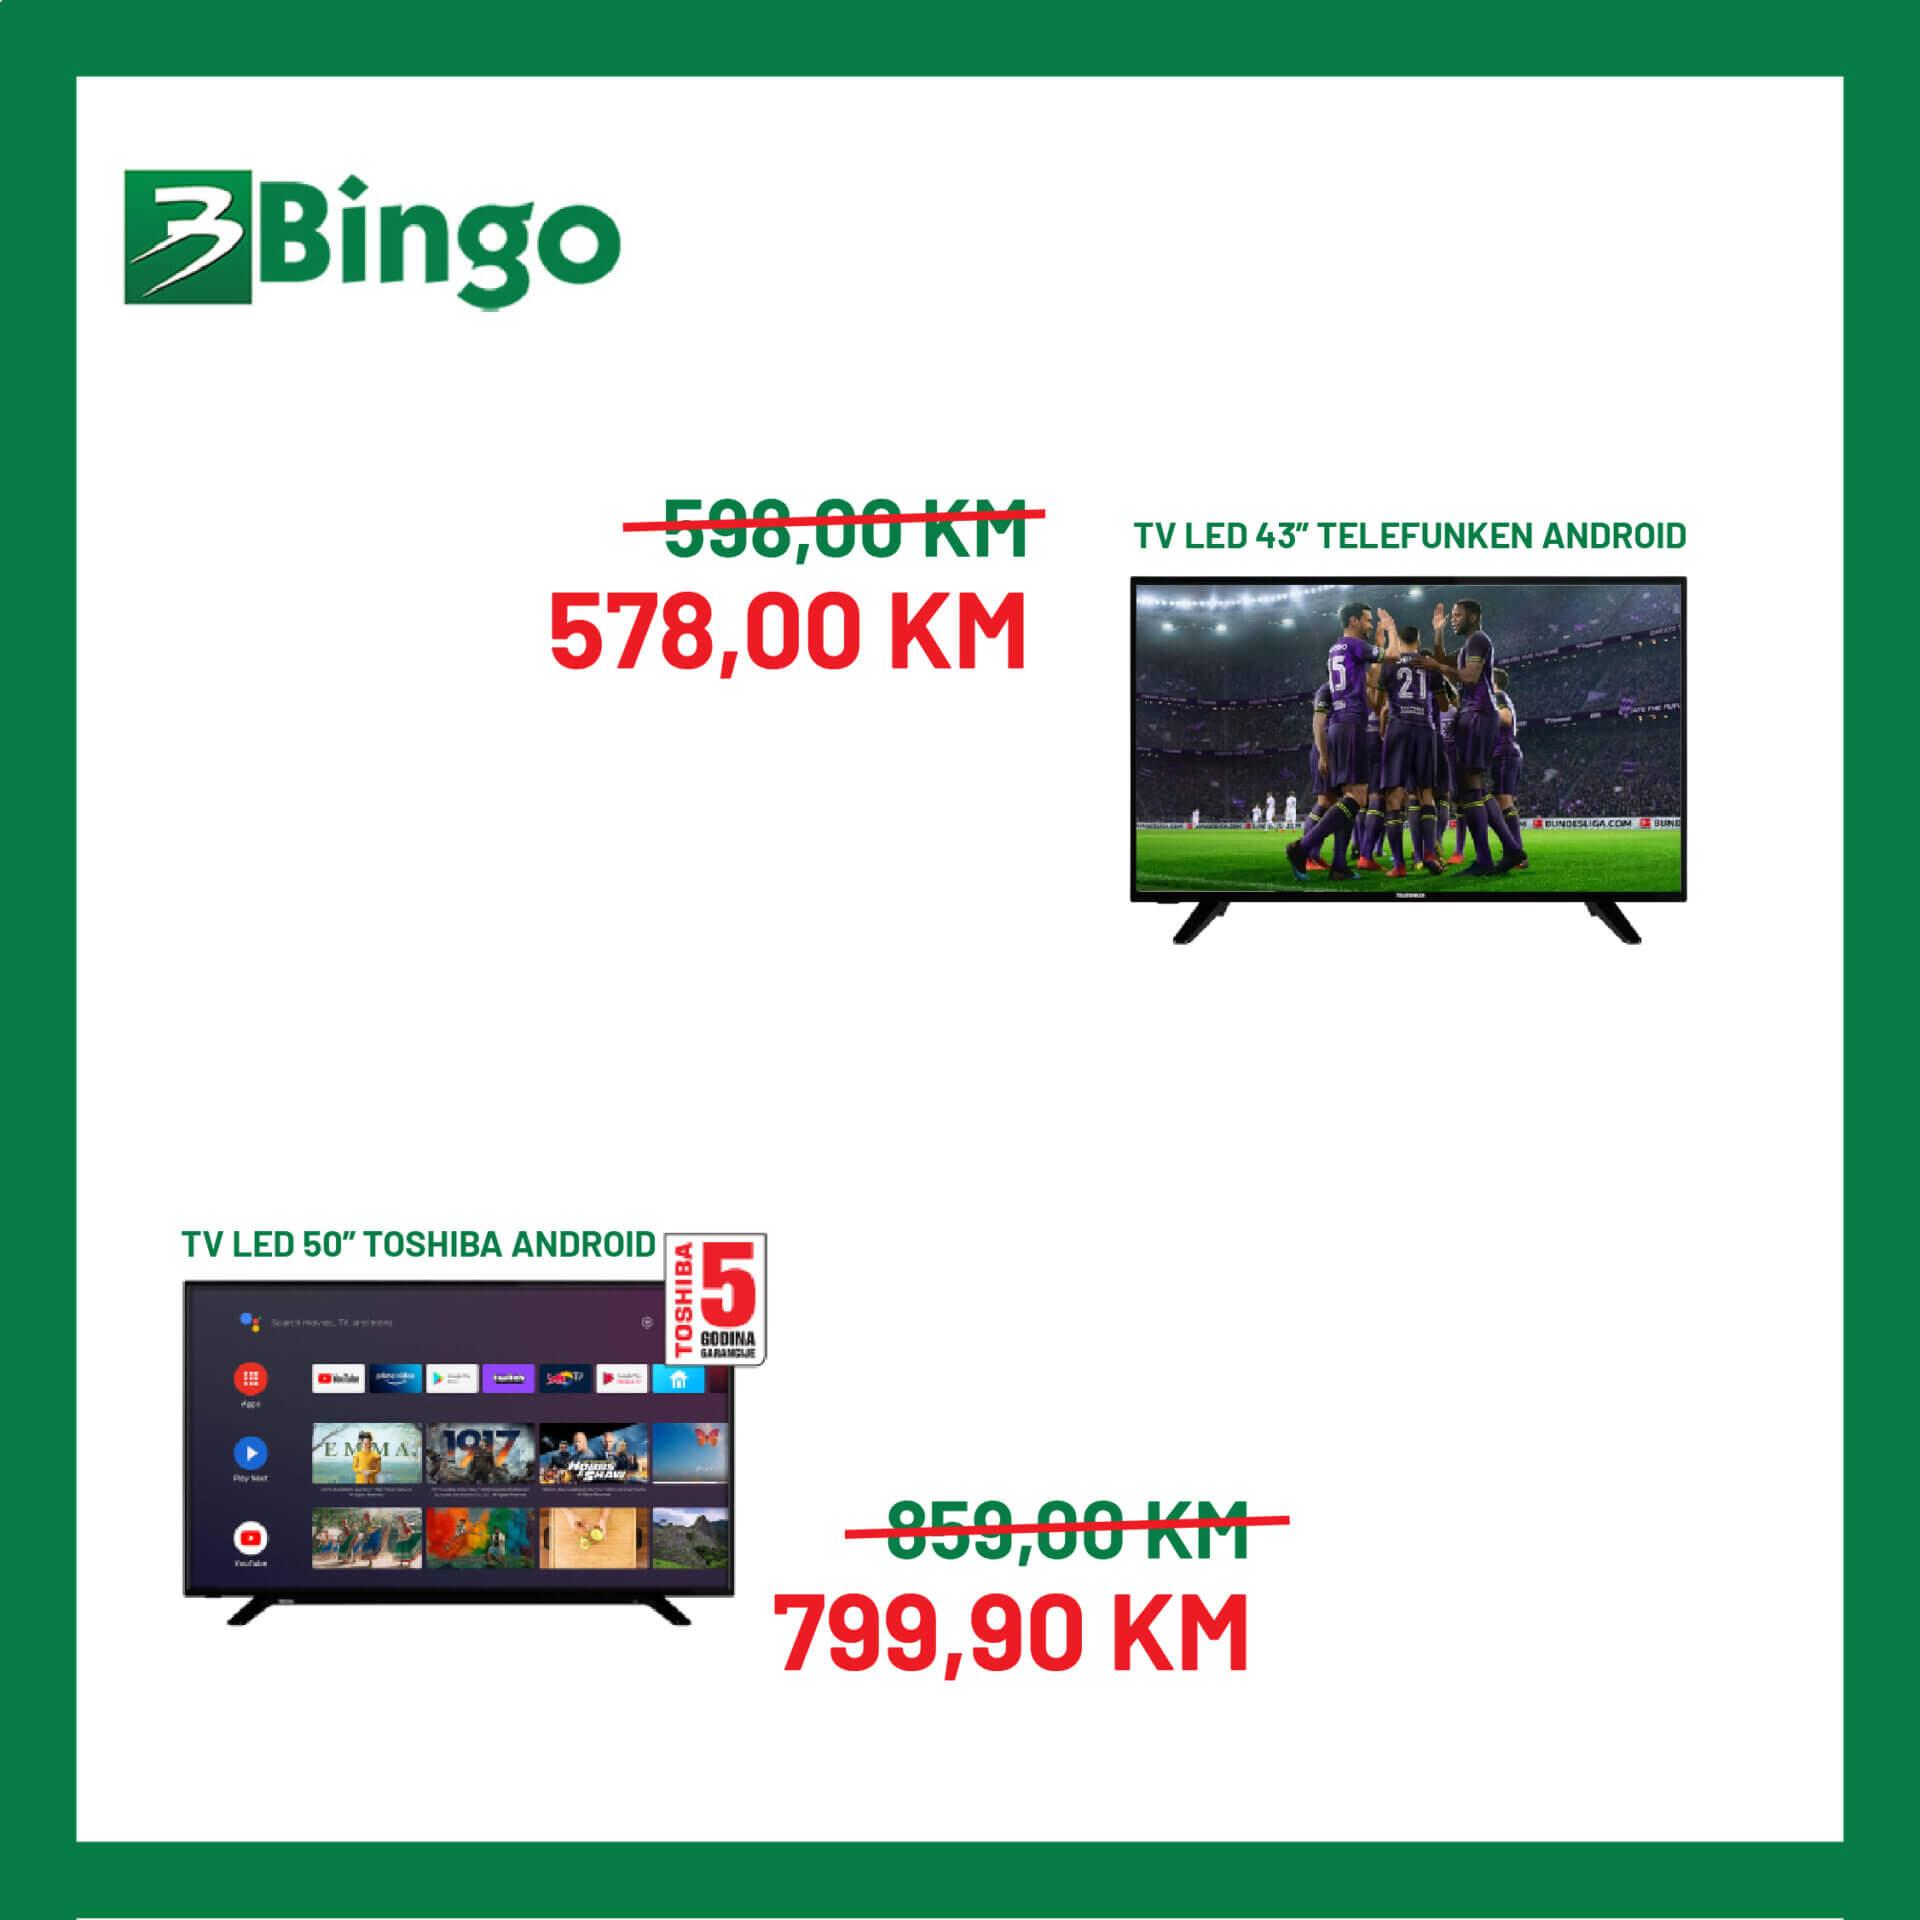 BINGO Katalog Super akcija JUL 2021 12.7.2021. 14.7.2021 3